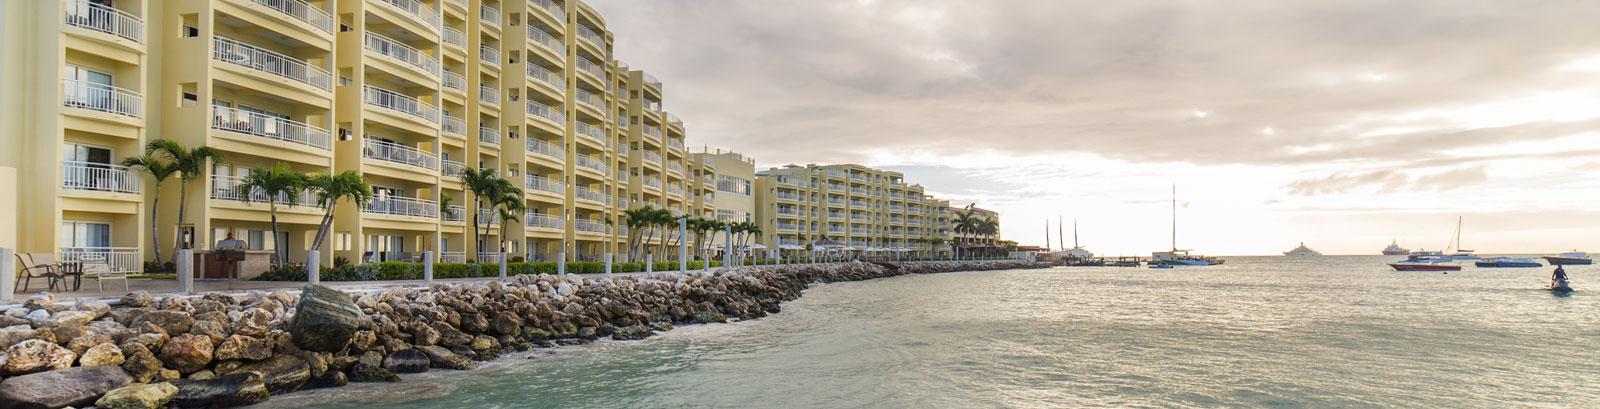 Les villas de Simpson Bay Resort - St. Maarten Luxury Villas